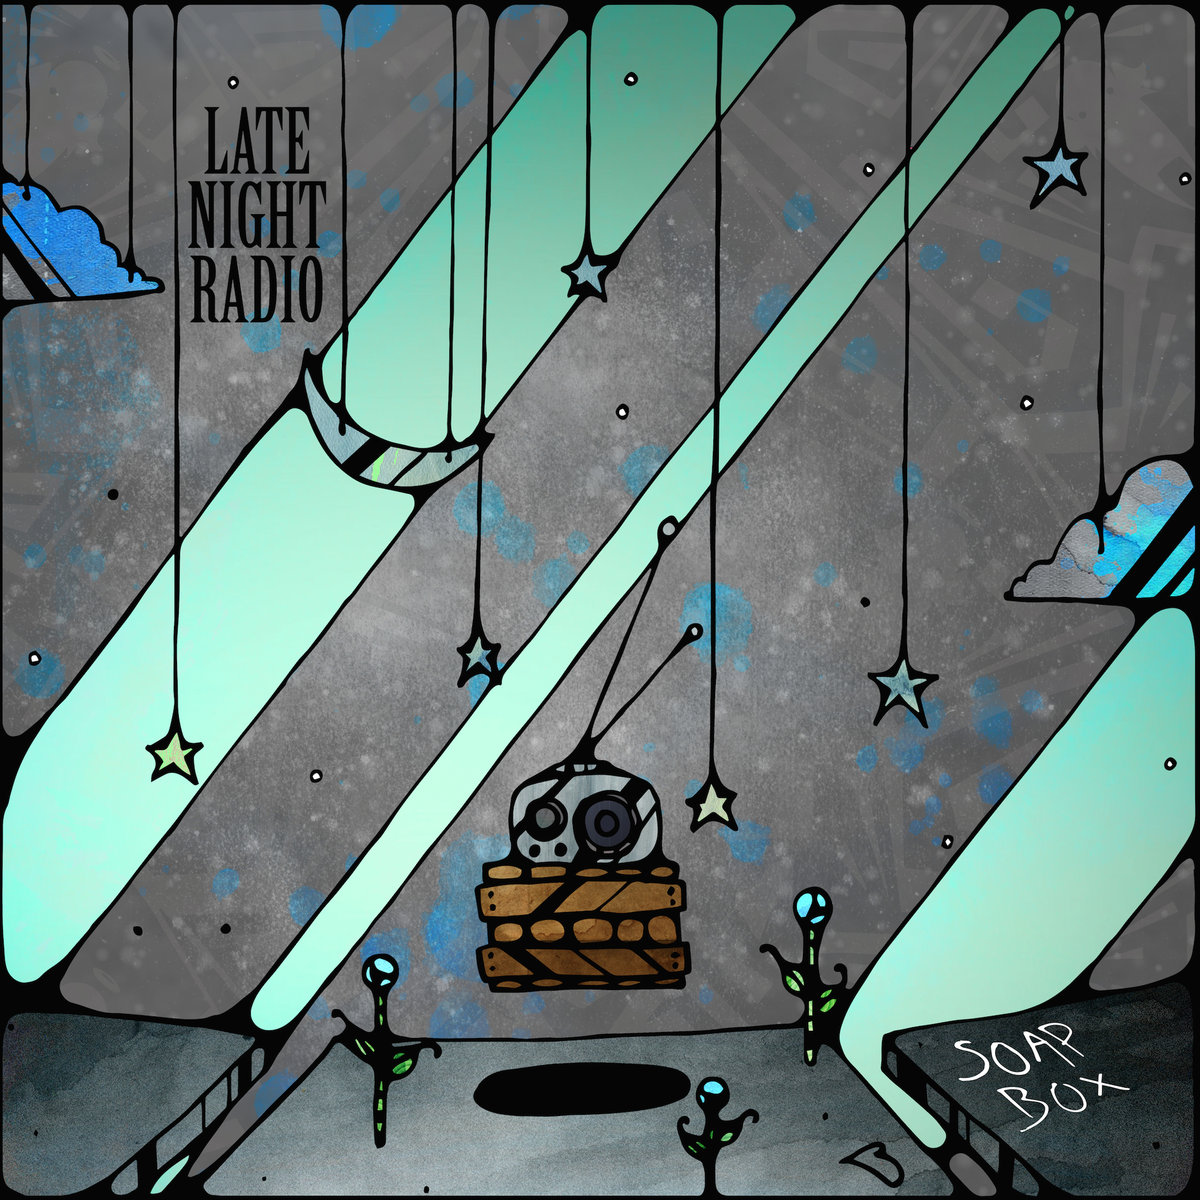 Late night radio | Soap Box | 2014